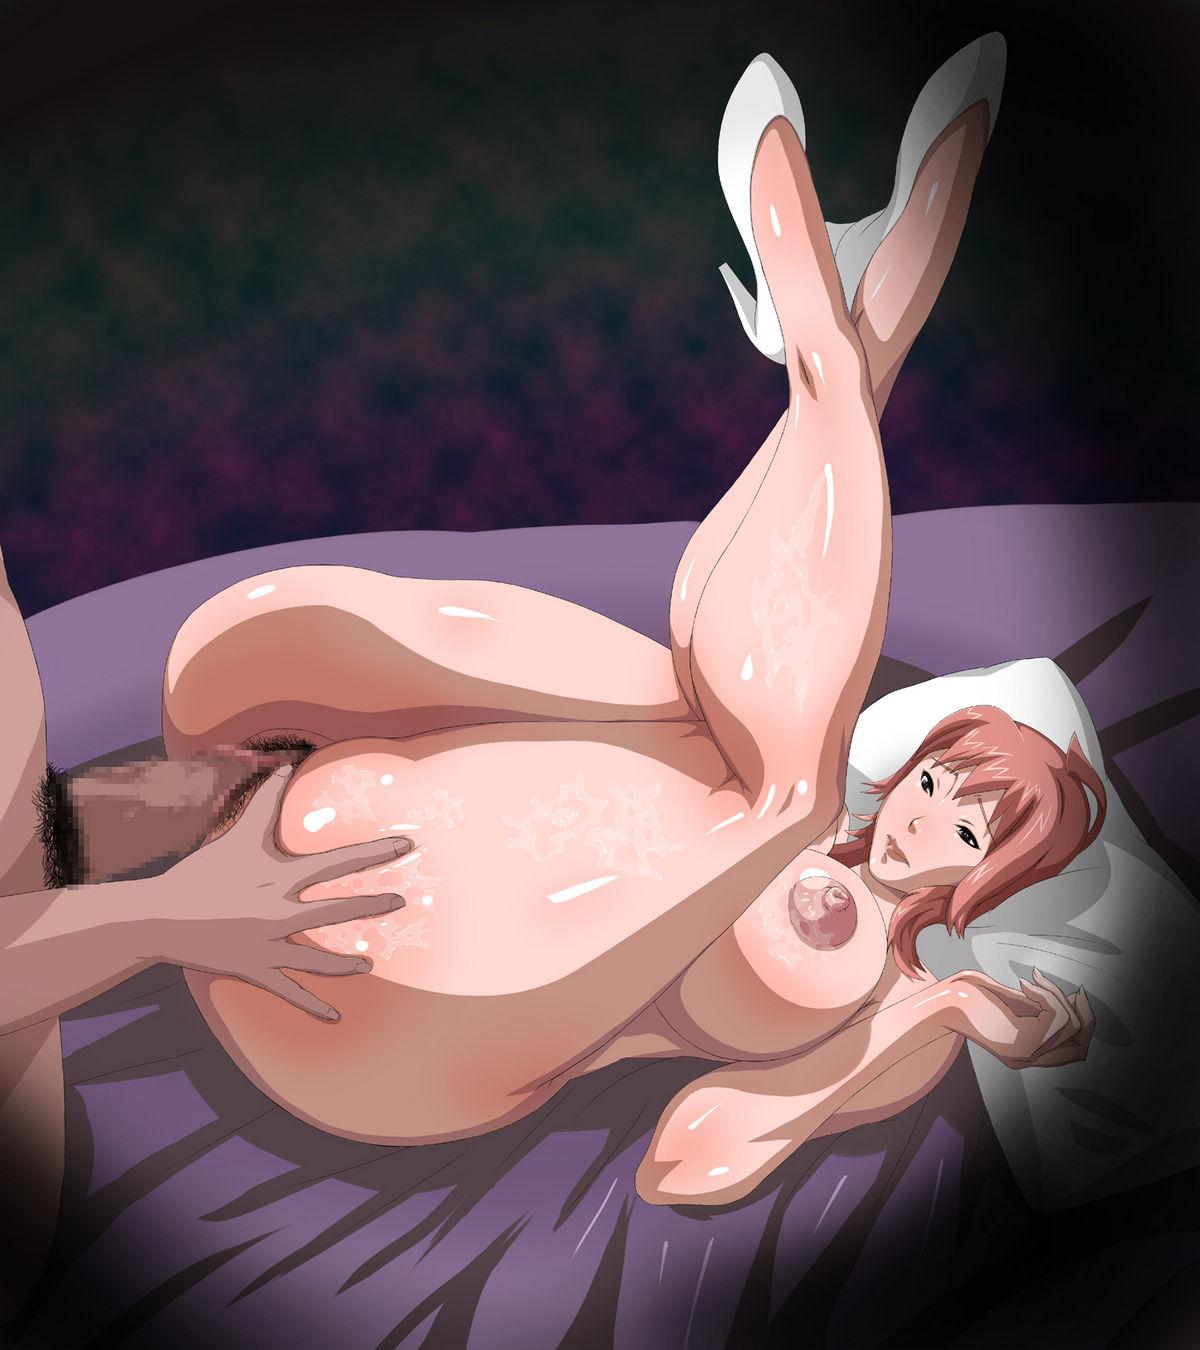 to to assistant-san mangaka-san Velma and daphne lesbian porn